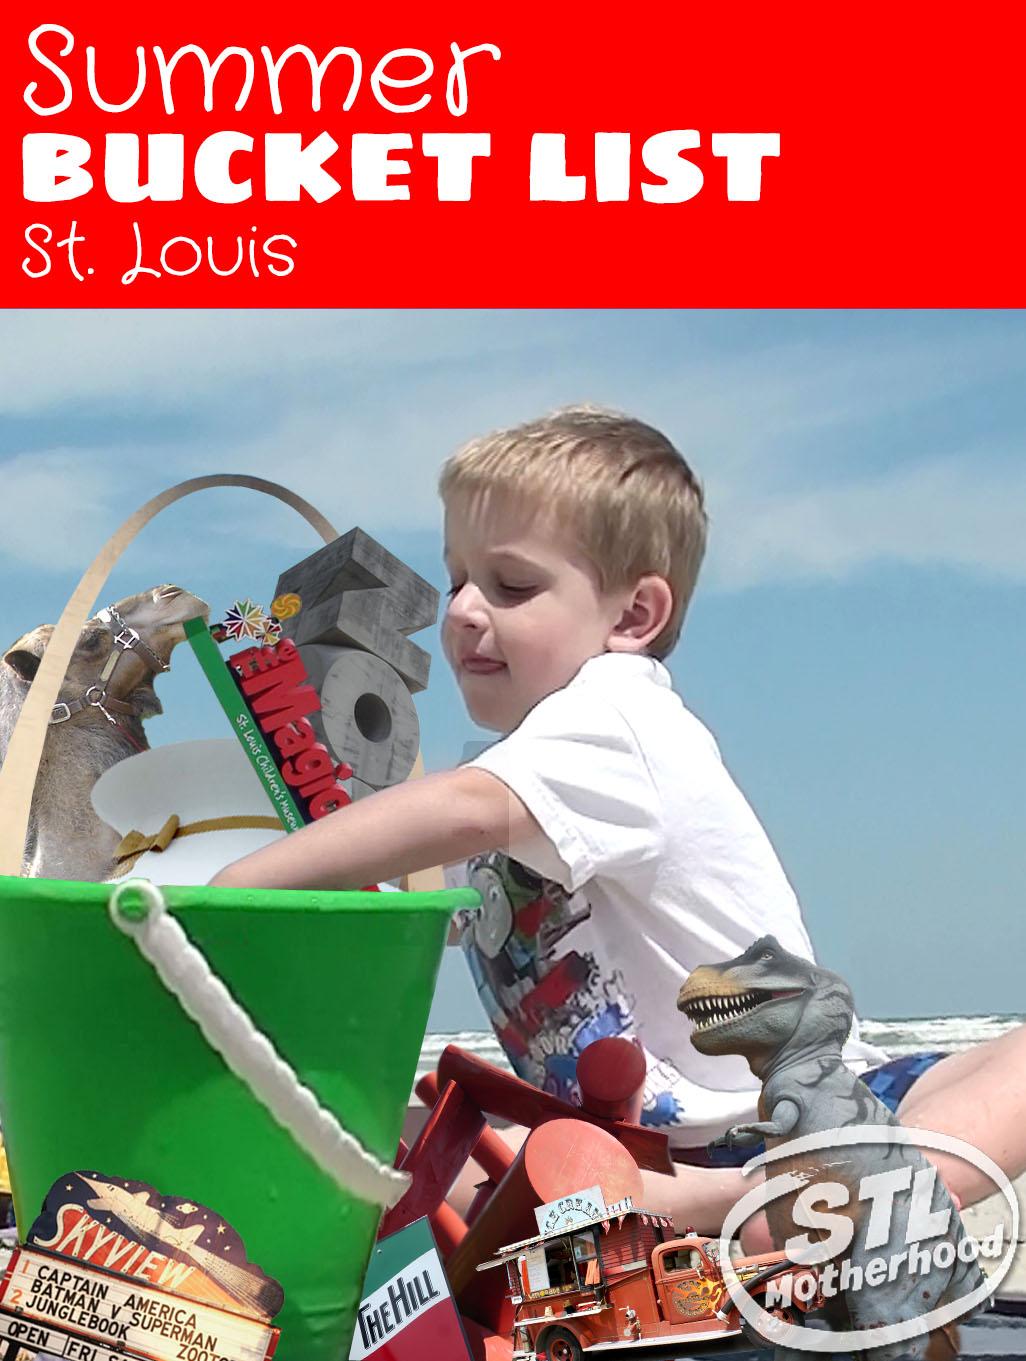 Summer Bucket List for kids in St. Louis